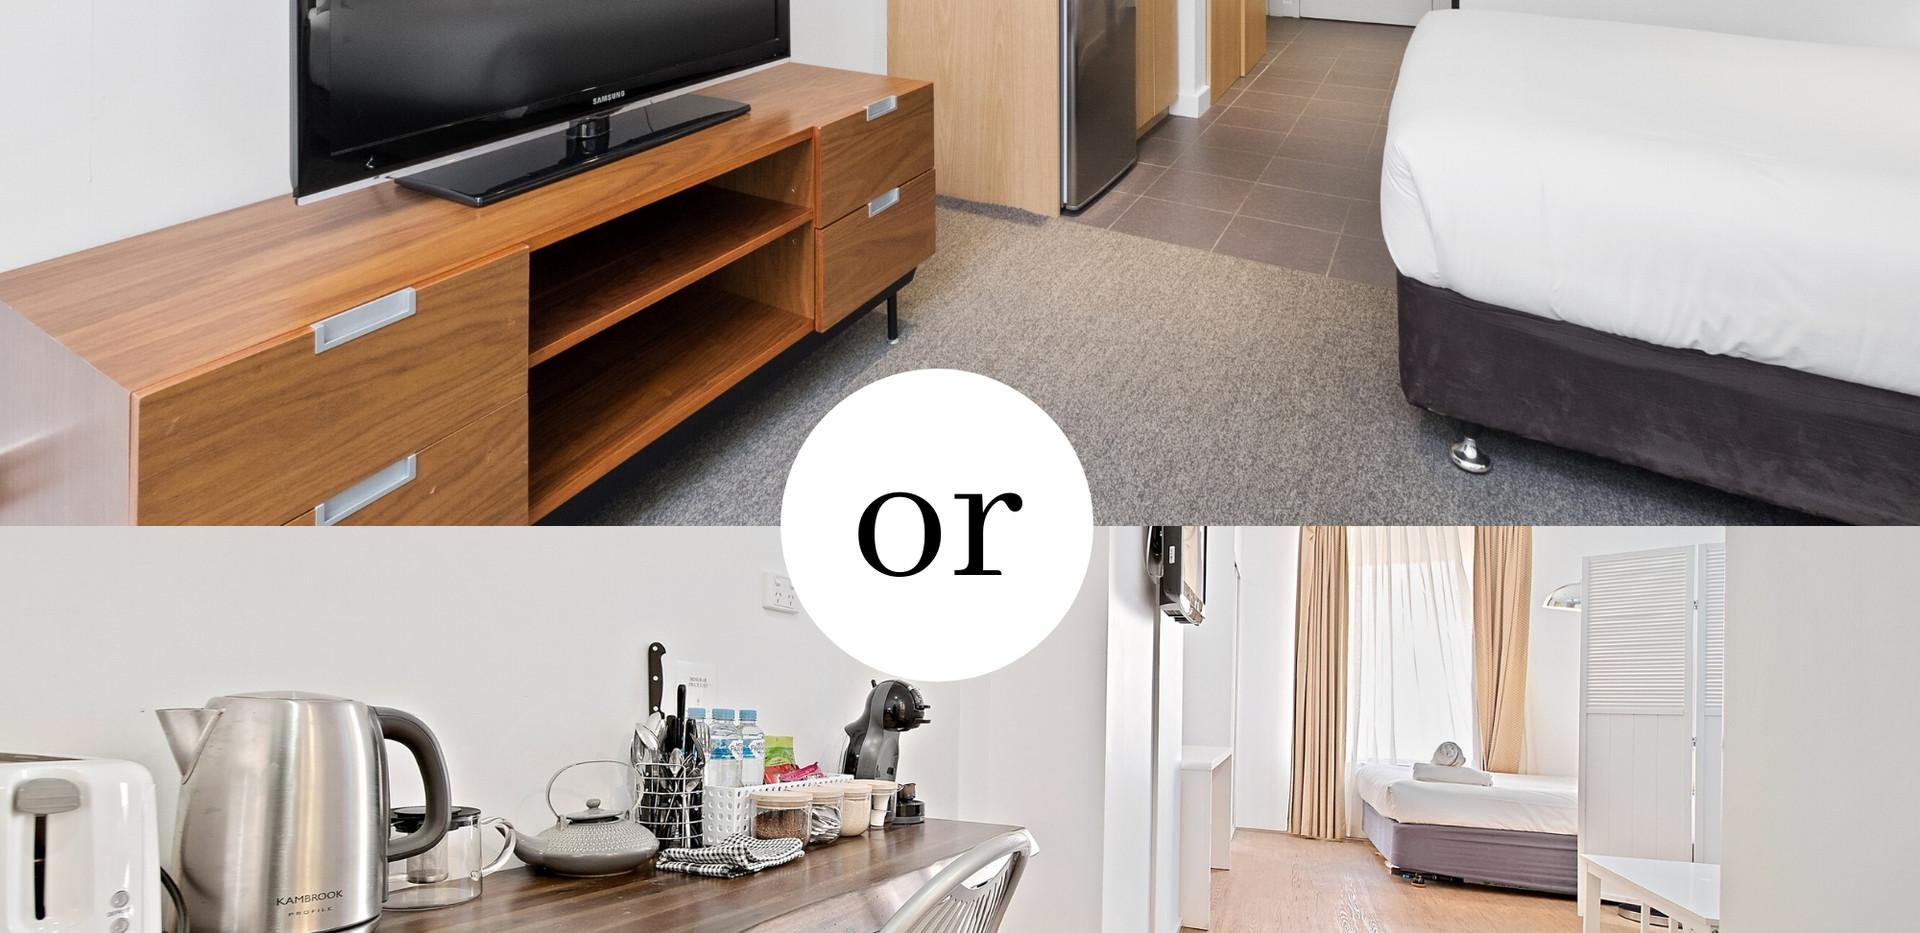 Executive Queen Room - All Suites Perth Serviced Apartments